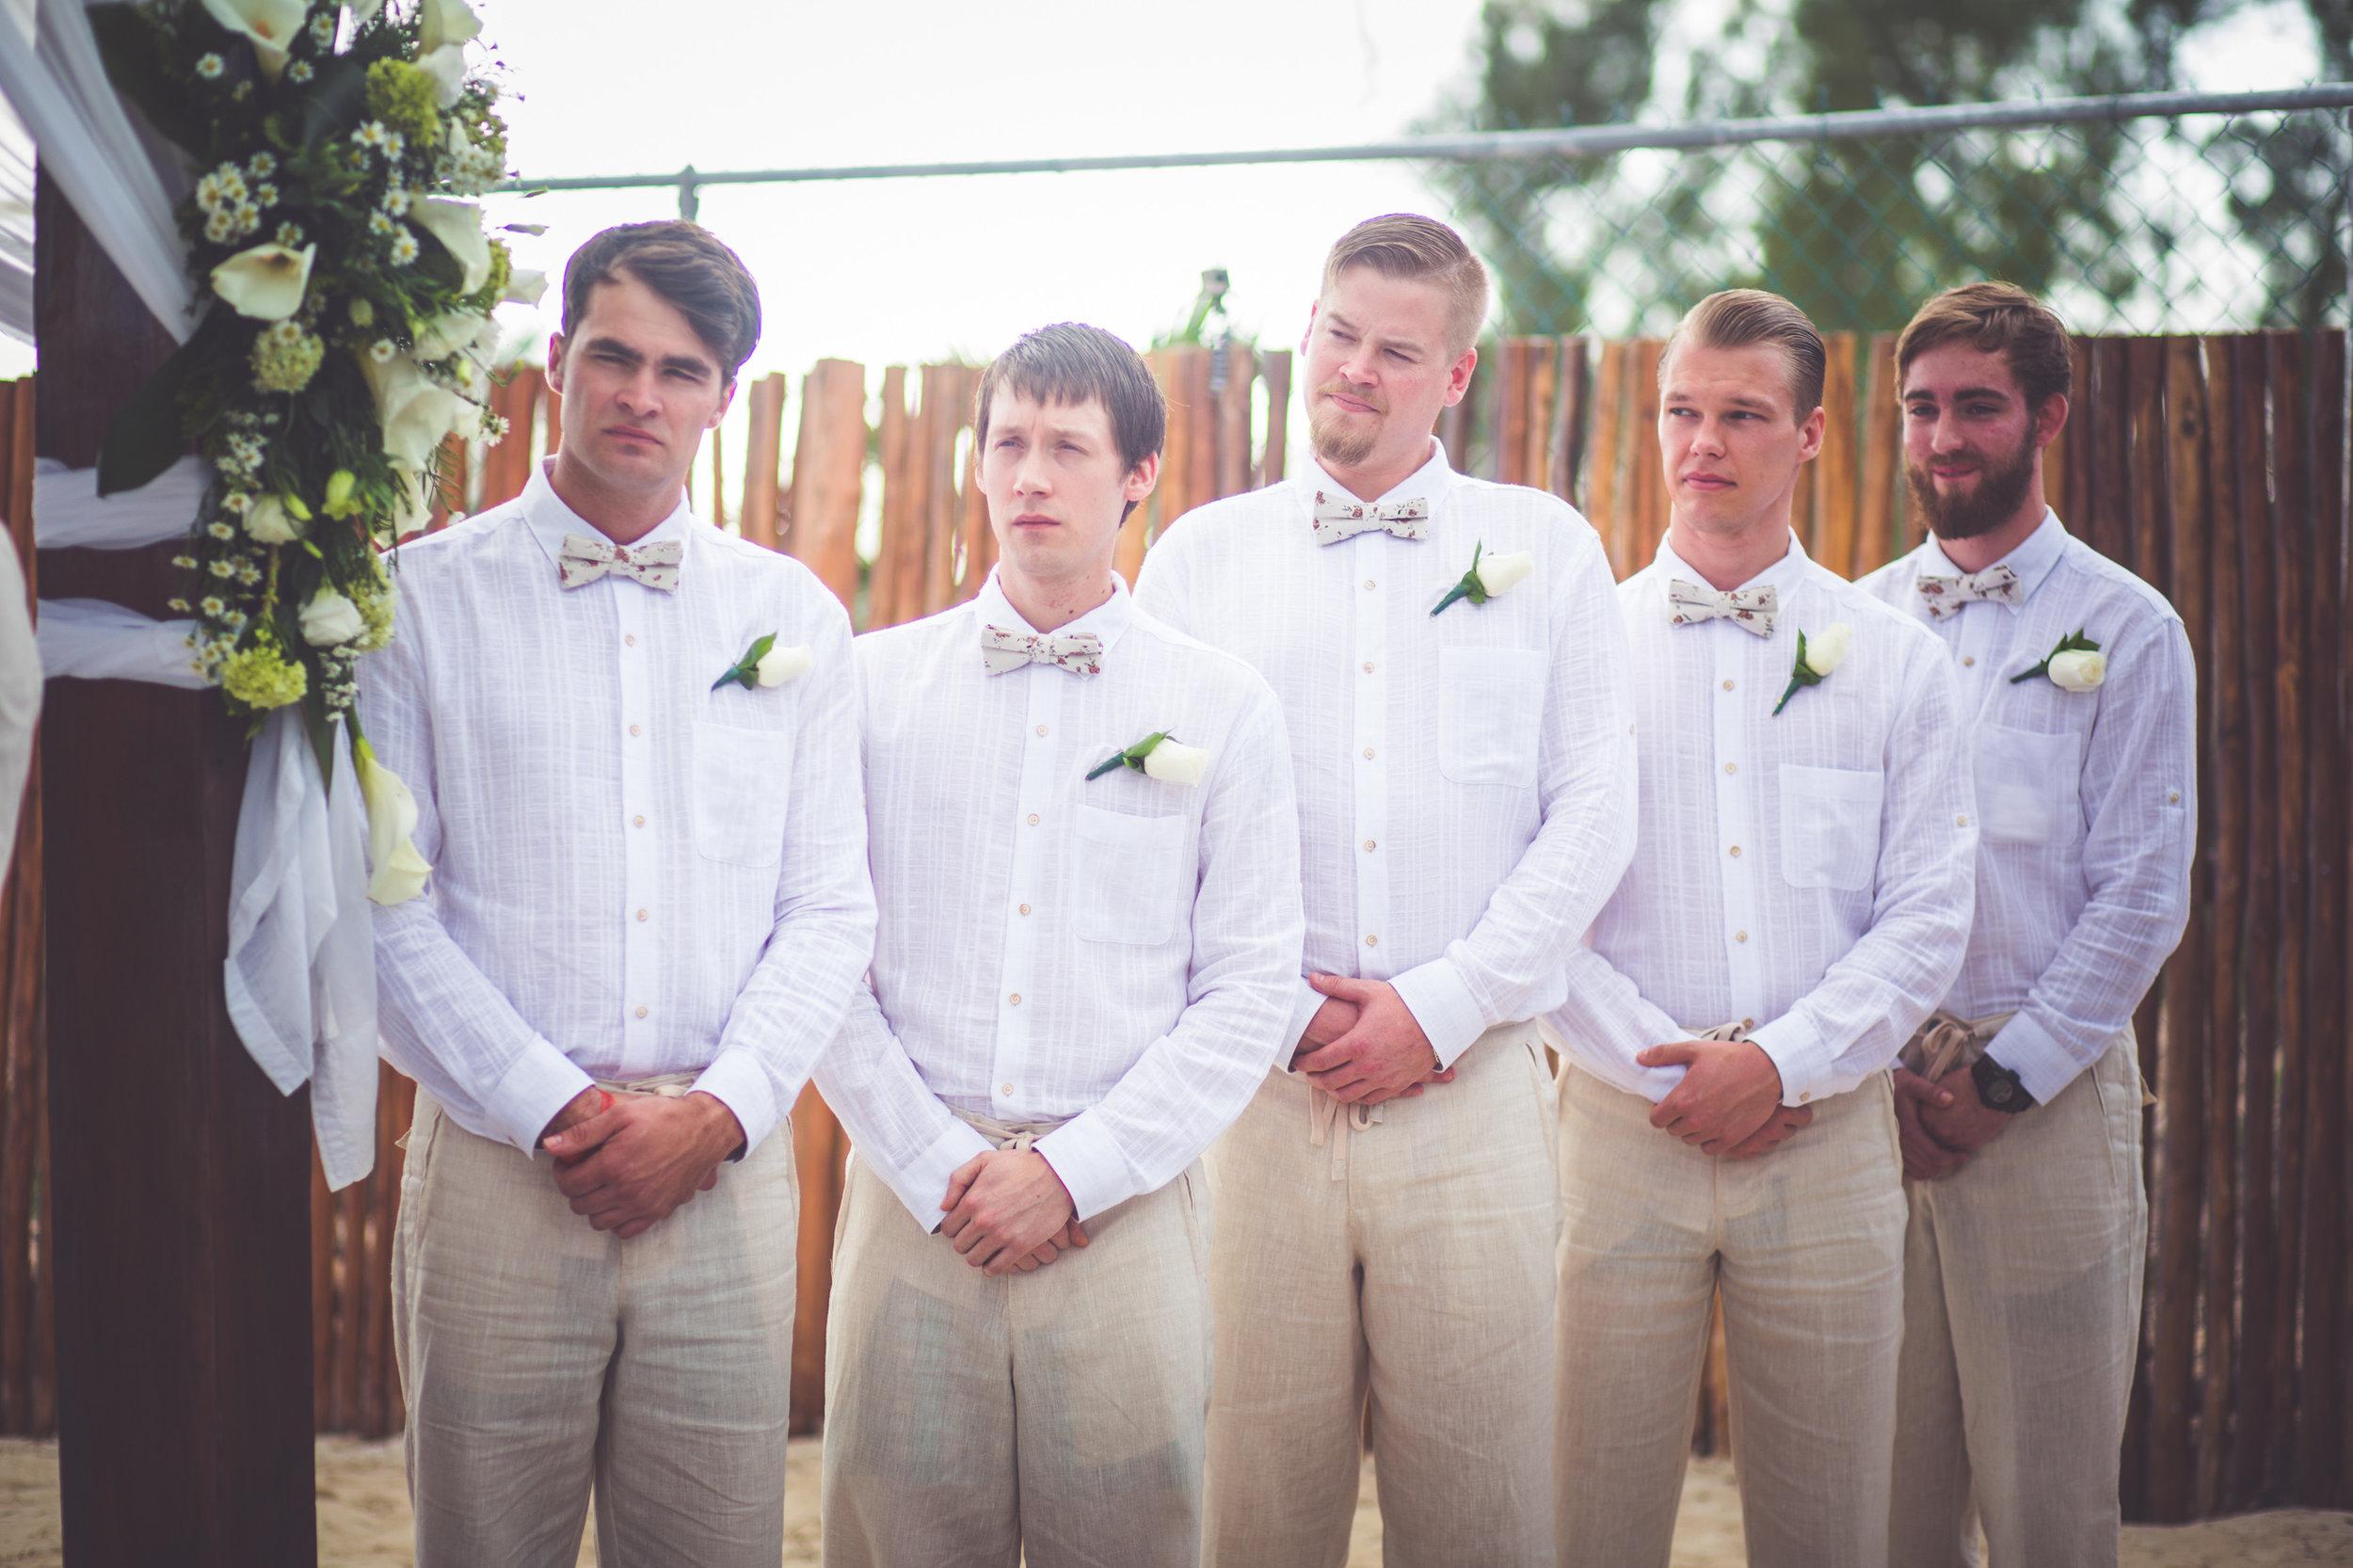 mexico wedding groomsmen attire